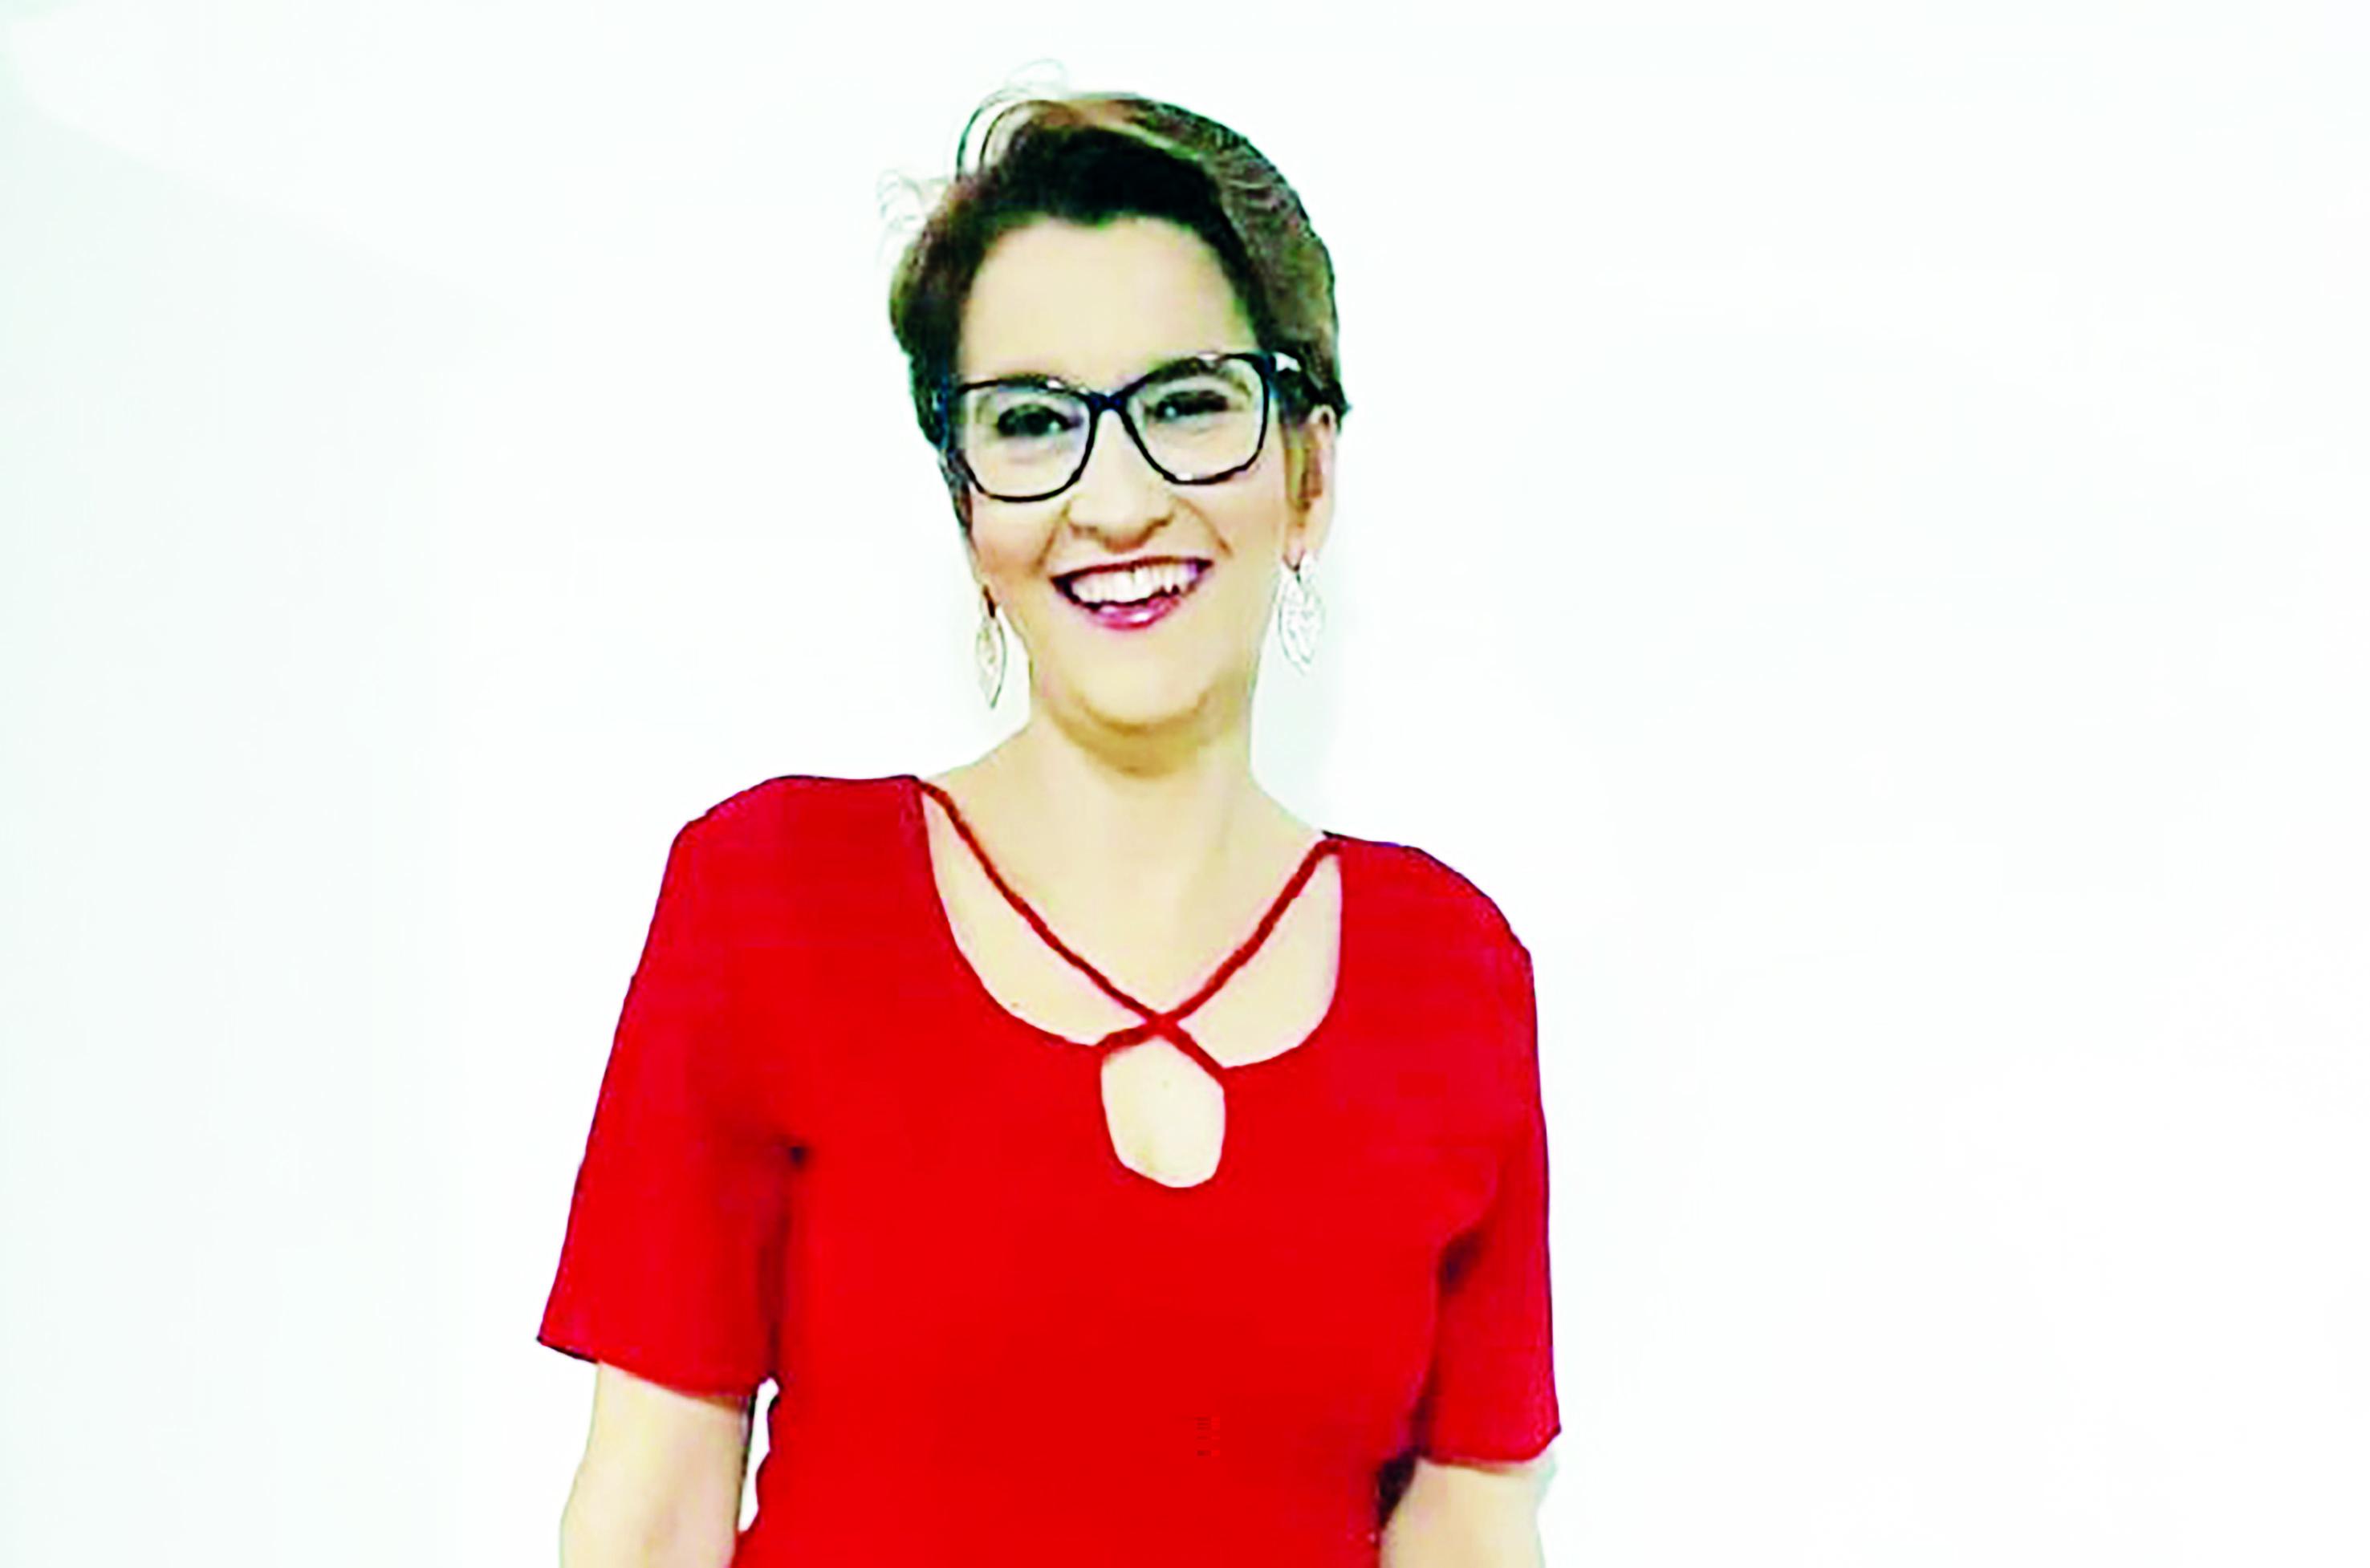 Coluna Élida Gontijo - Fazendo faxina